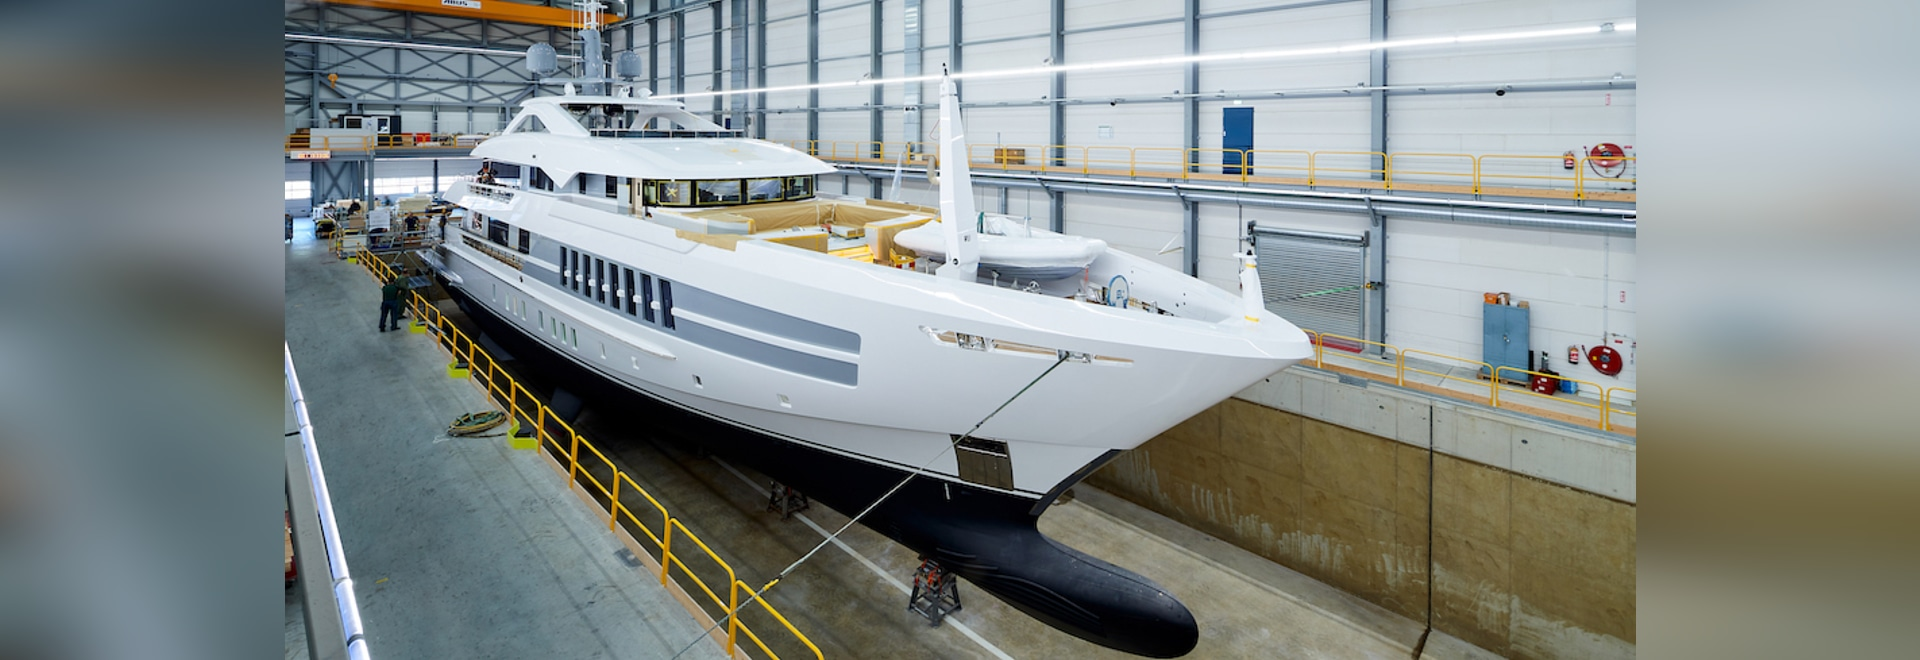 Heesen lanciert 55m Superyacht Projekt Castor